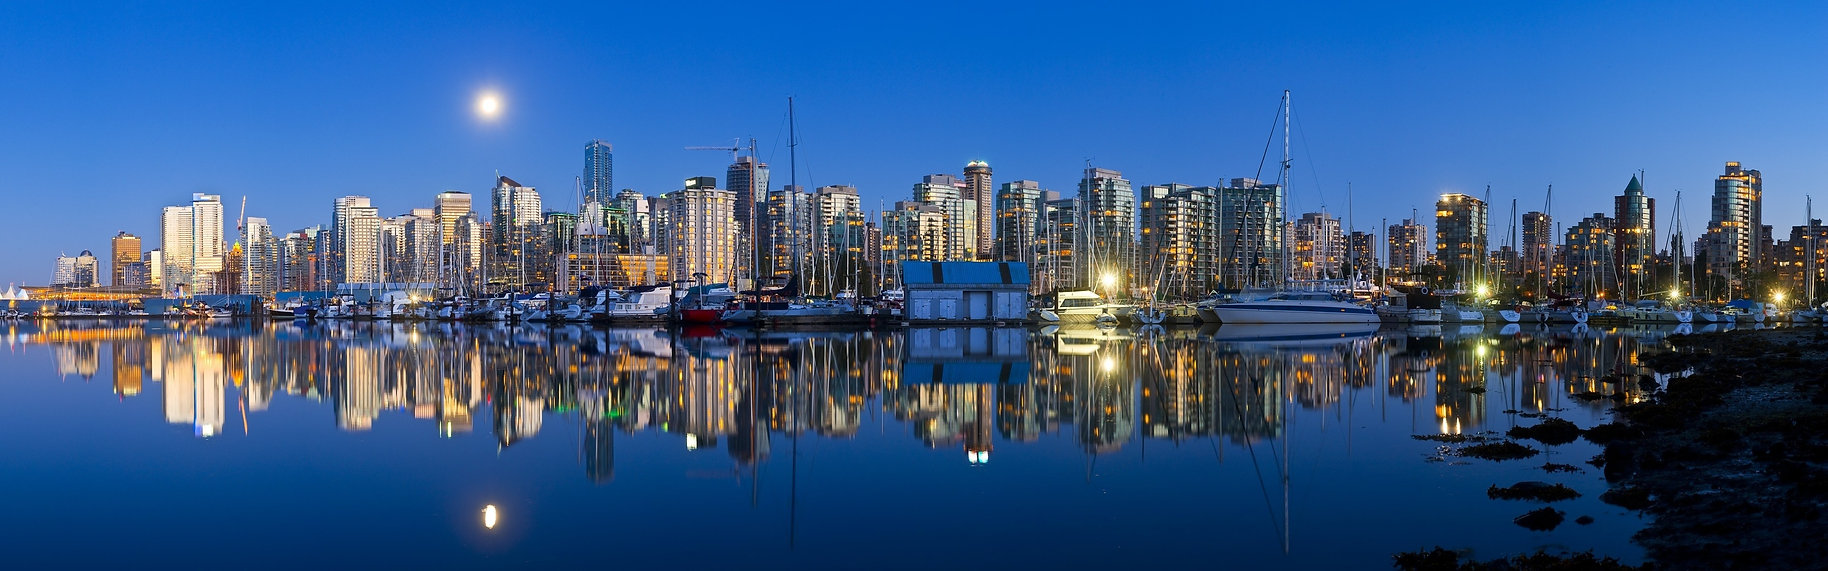 1247847-vancouver-skyline-wallpaper-3840